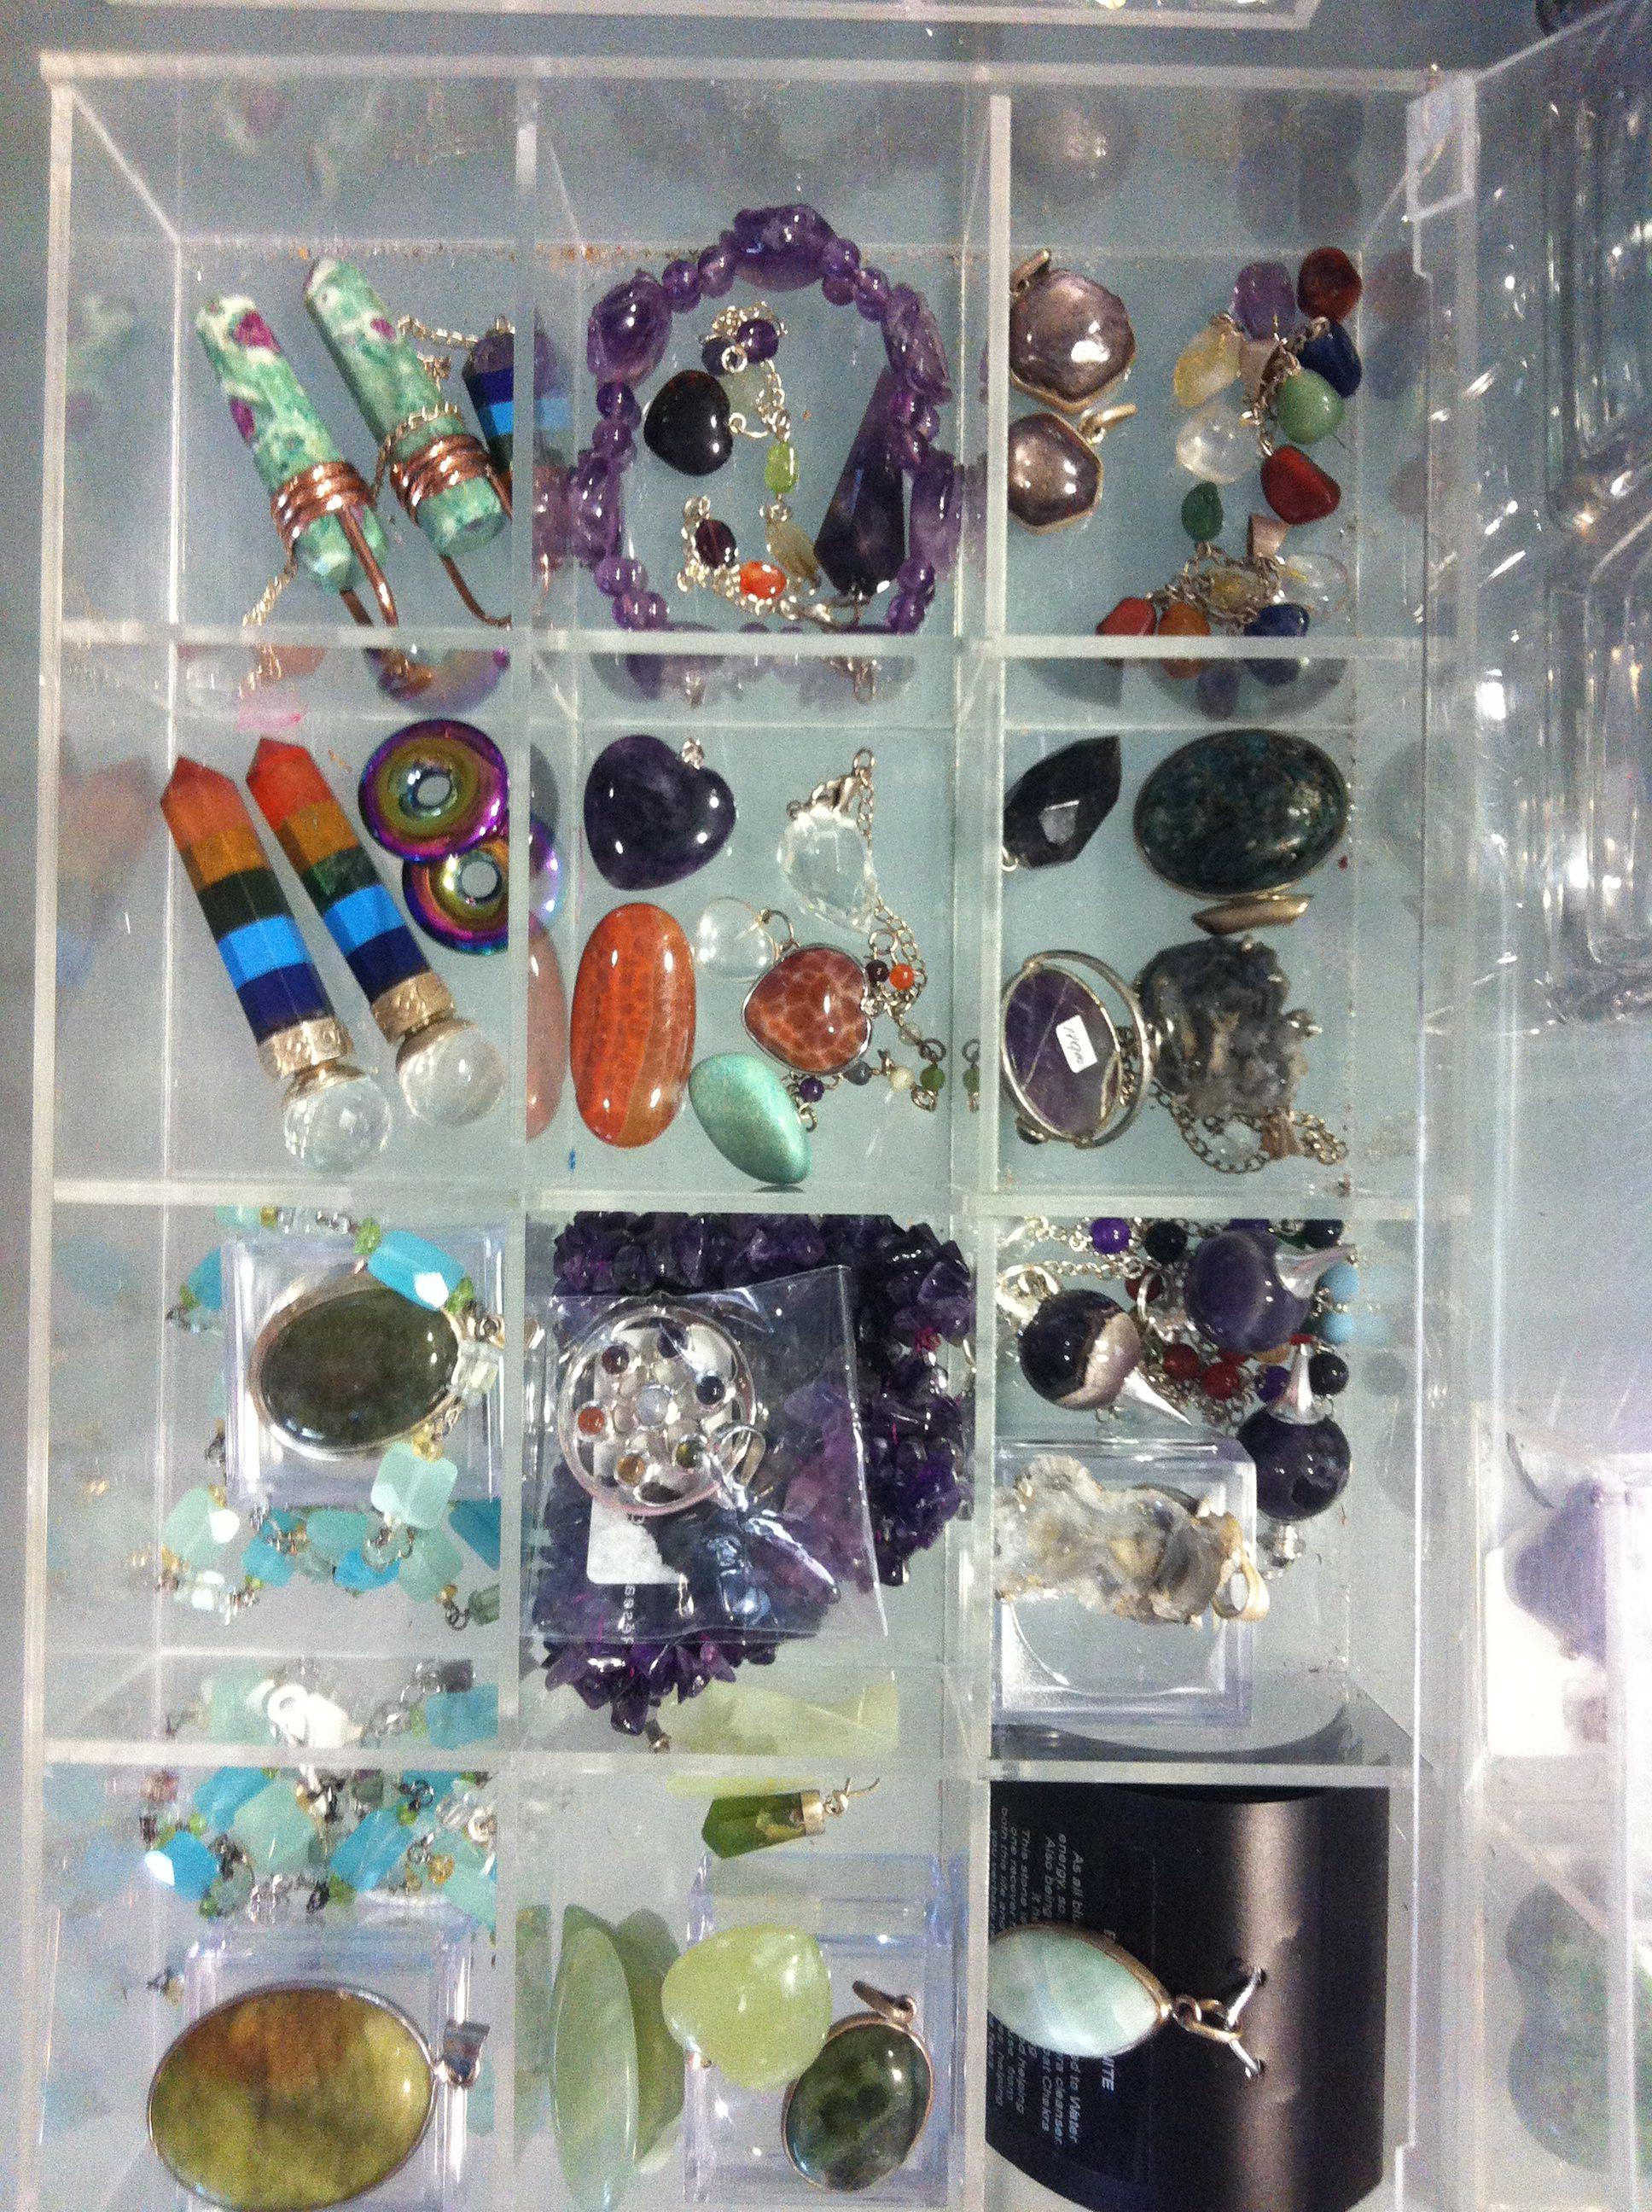 Crystalls-Κρύσταλλοι Μόνο Εδώ http://www.azima.gr